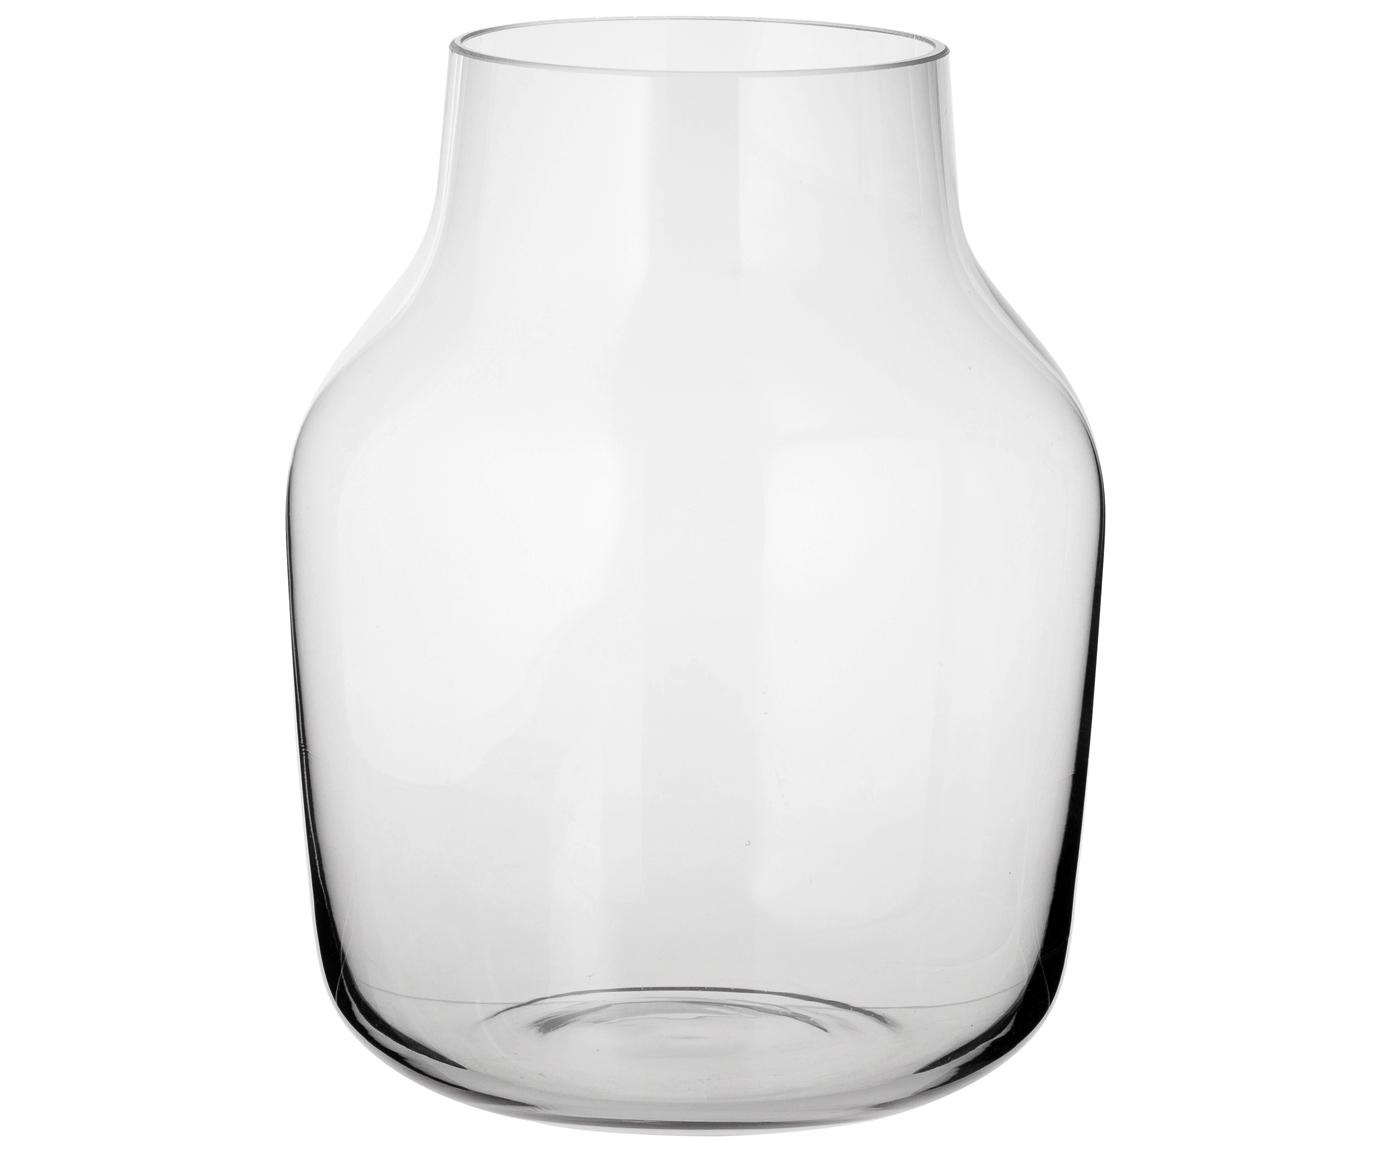 Mundgeblasene Design-Vase Silent, Glas, Grau, Transparent, H 19 cm